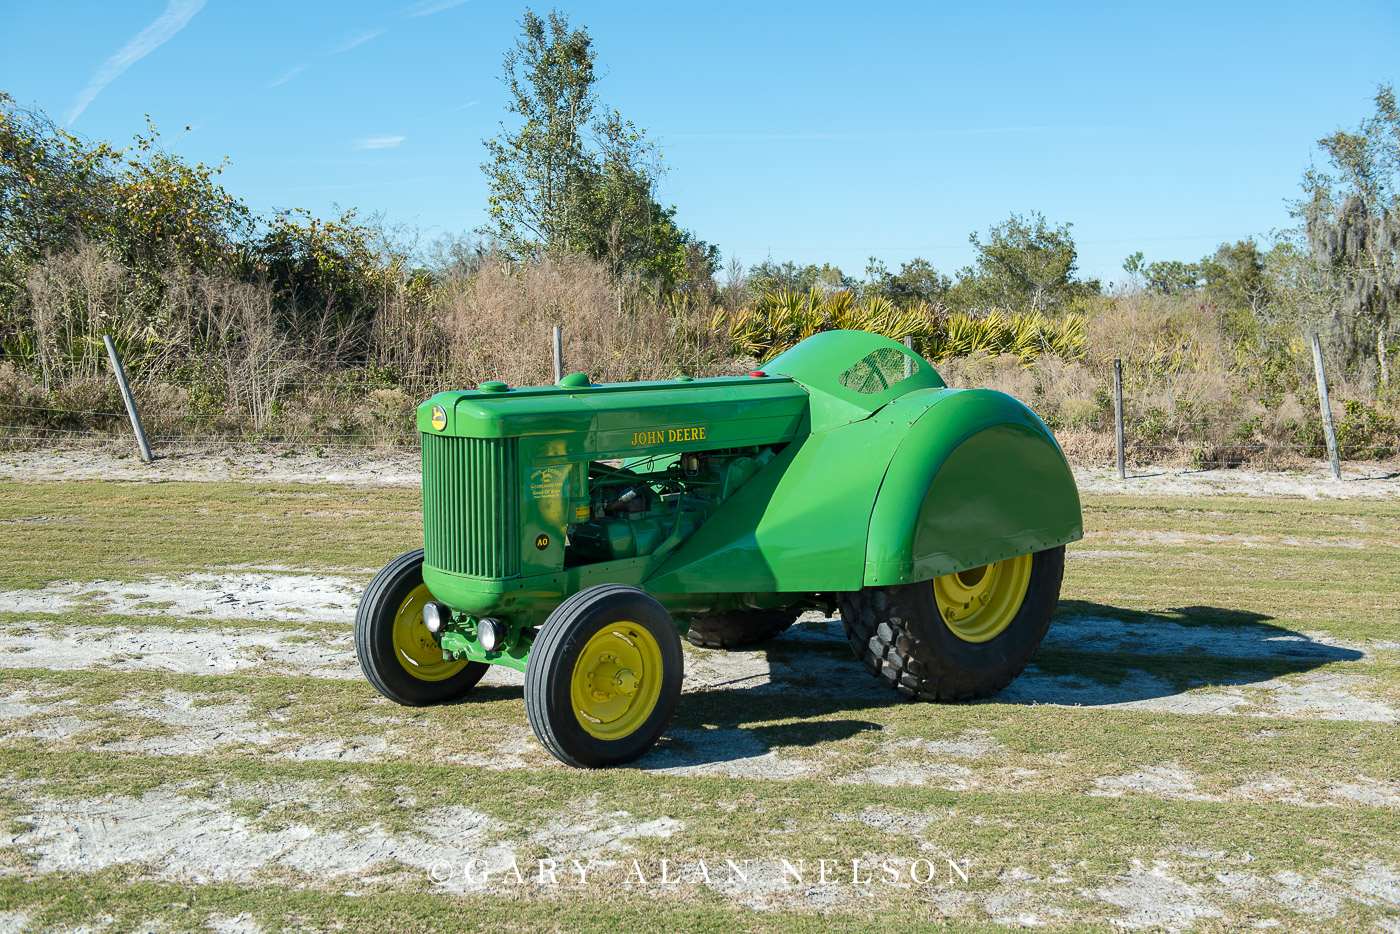 1950 John Deere AO Orchard